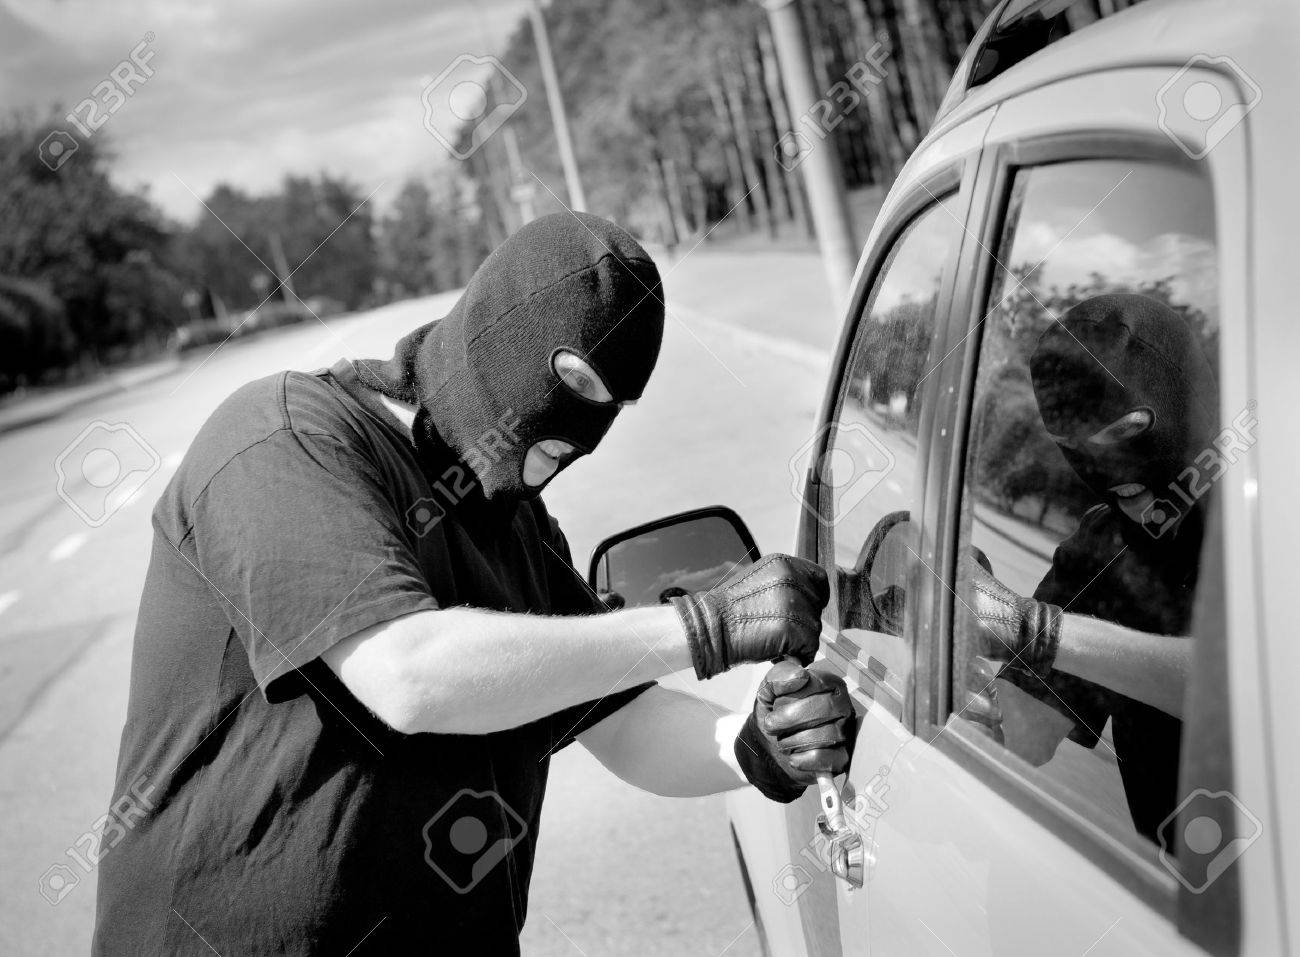 Thief breaks into a car door on the street - 10065367